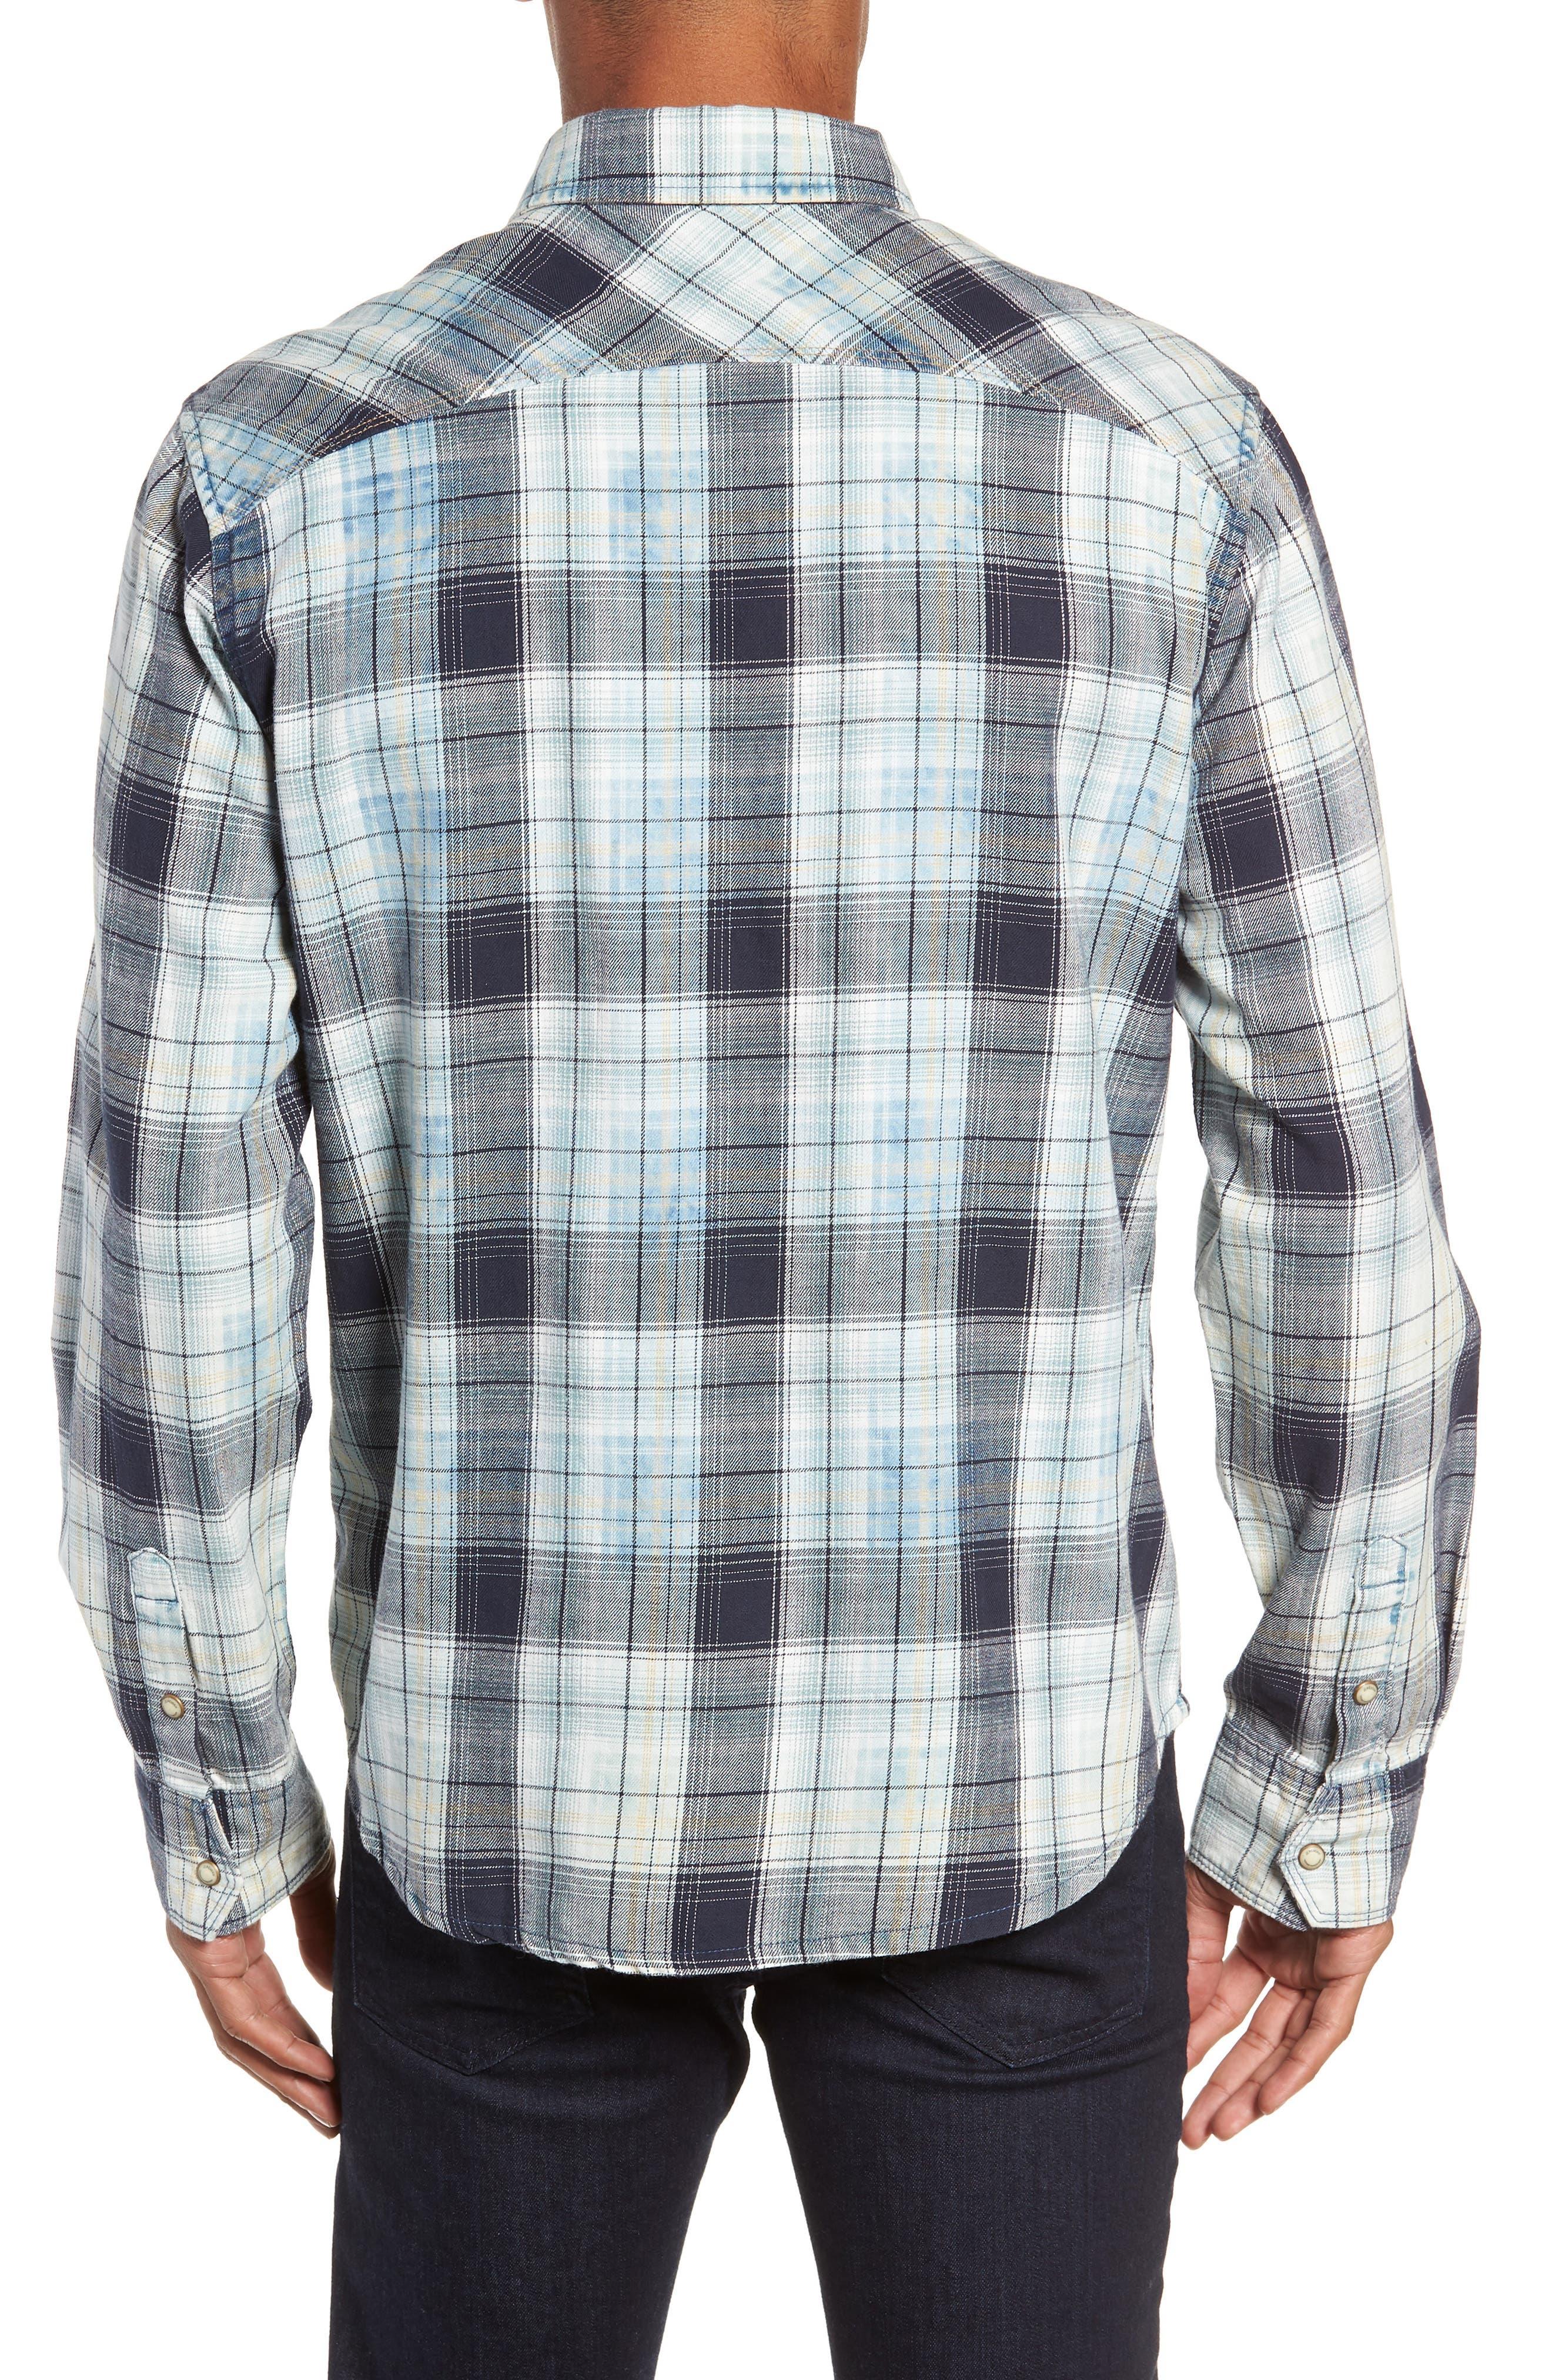 Sawtooth Regular Fit Crosshatch Plaid Shirt,                             Alternate thumbnail 3, color,                             ENSIGN BLUE